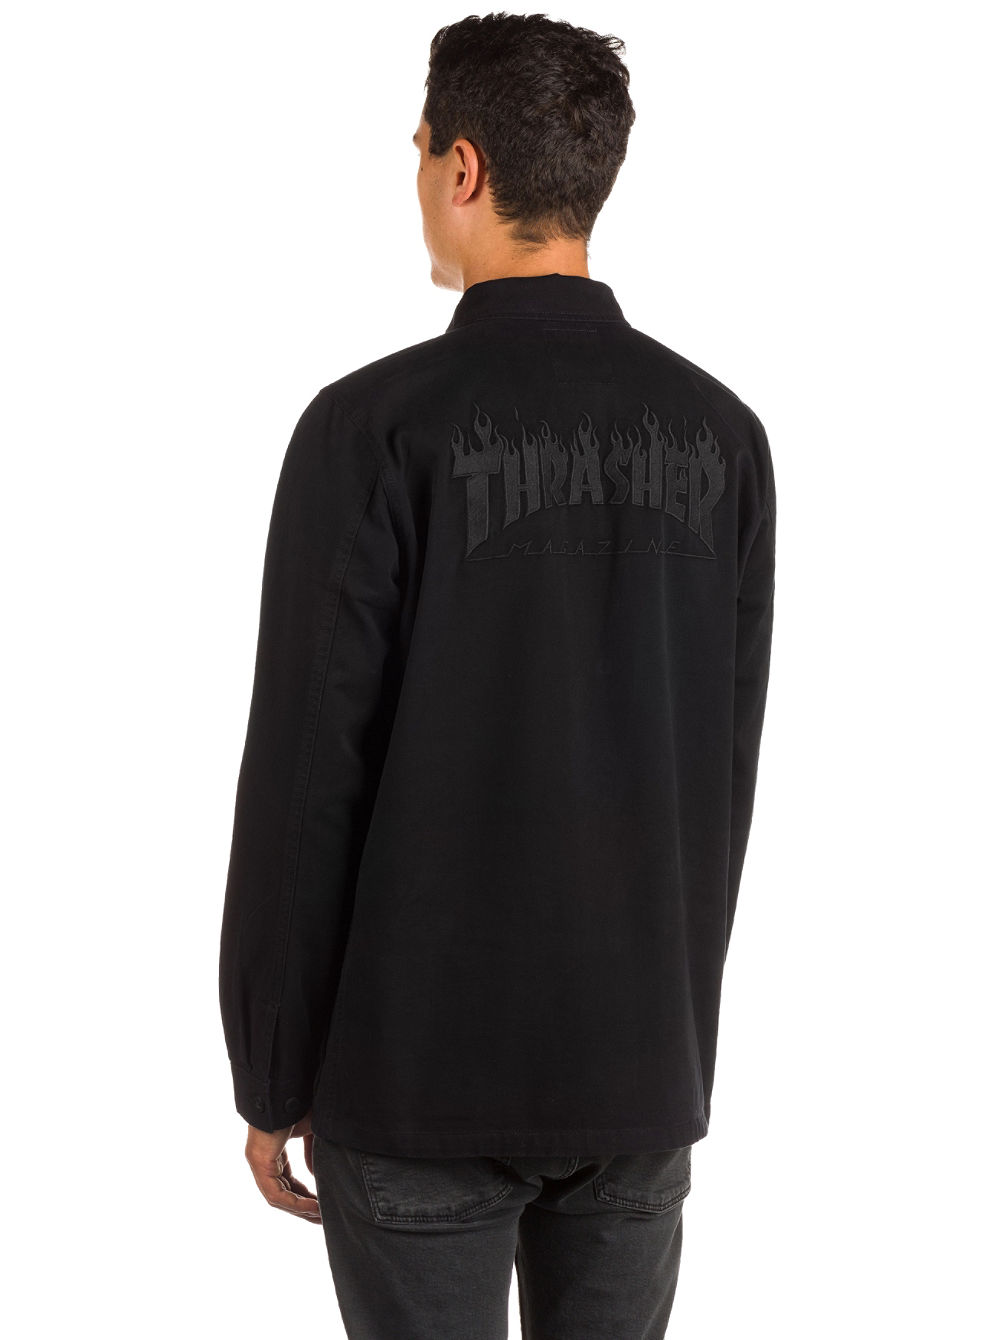 aa884d2cf360 Buy Vans X Thrasher M65 Jacket online at Blue Tomato